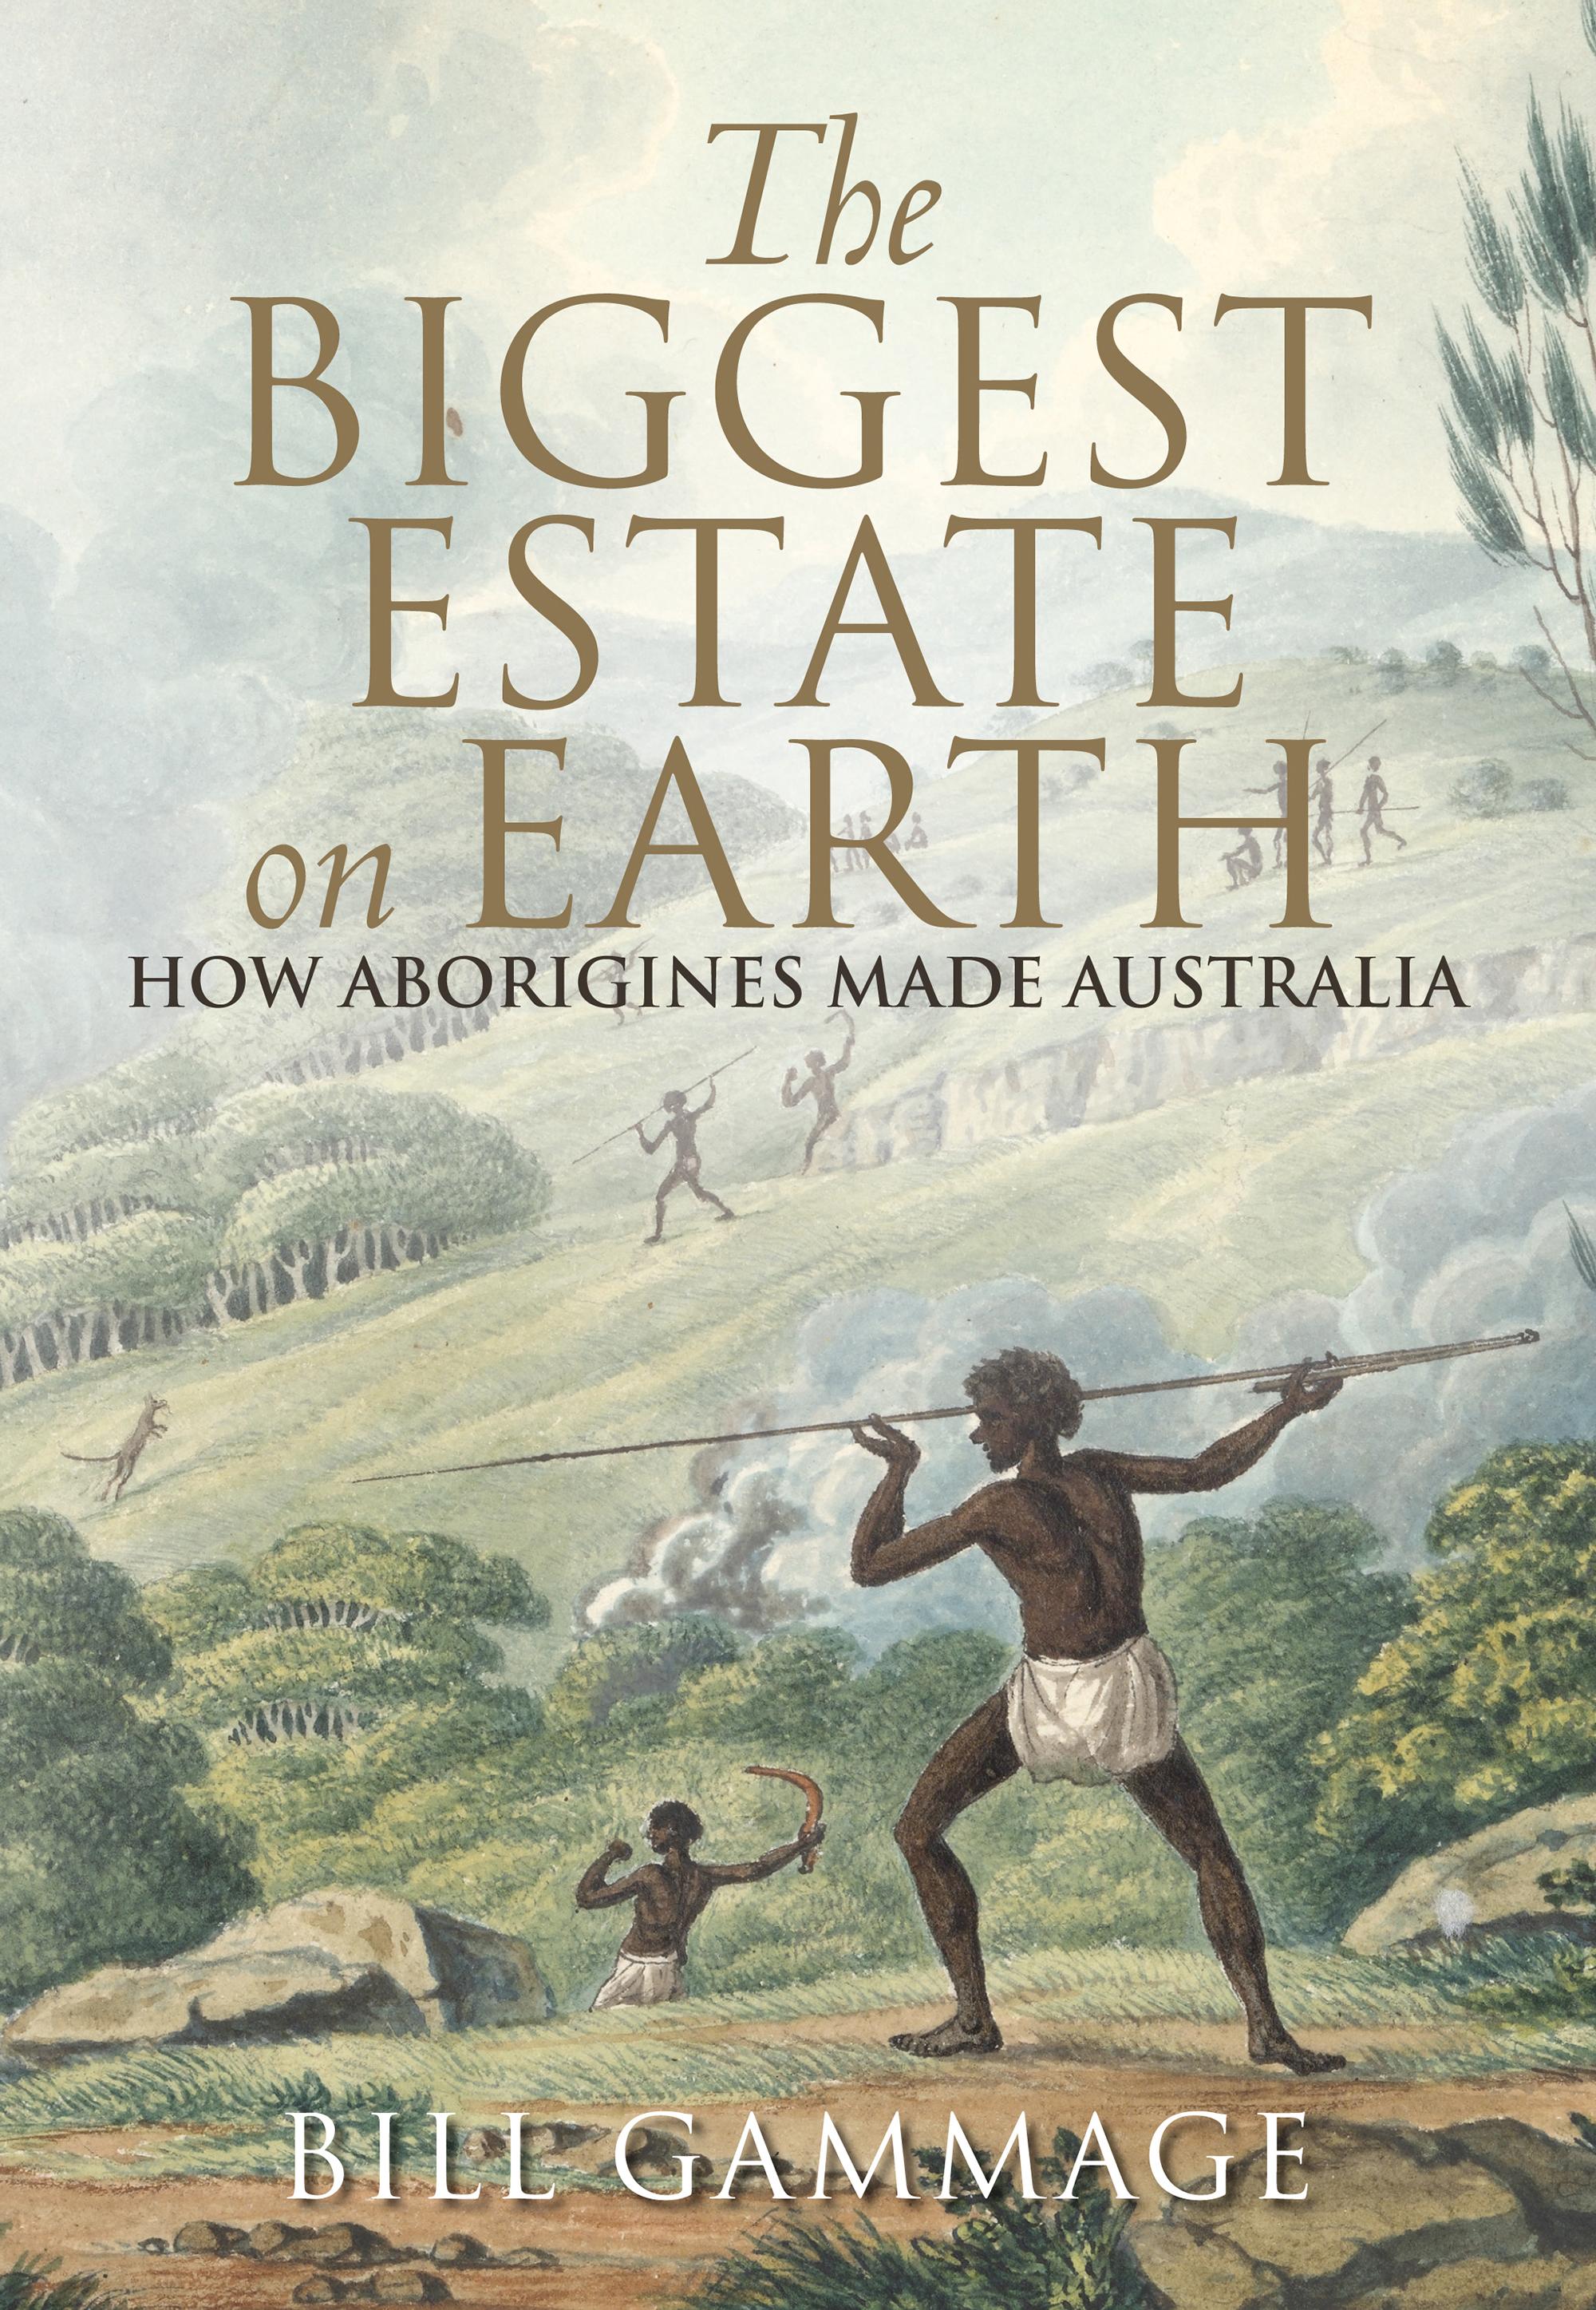 The biggest estate on earth (2011, Allen & Unwin)